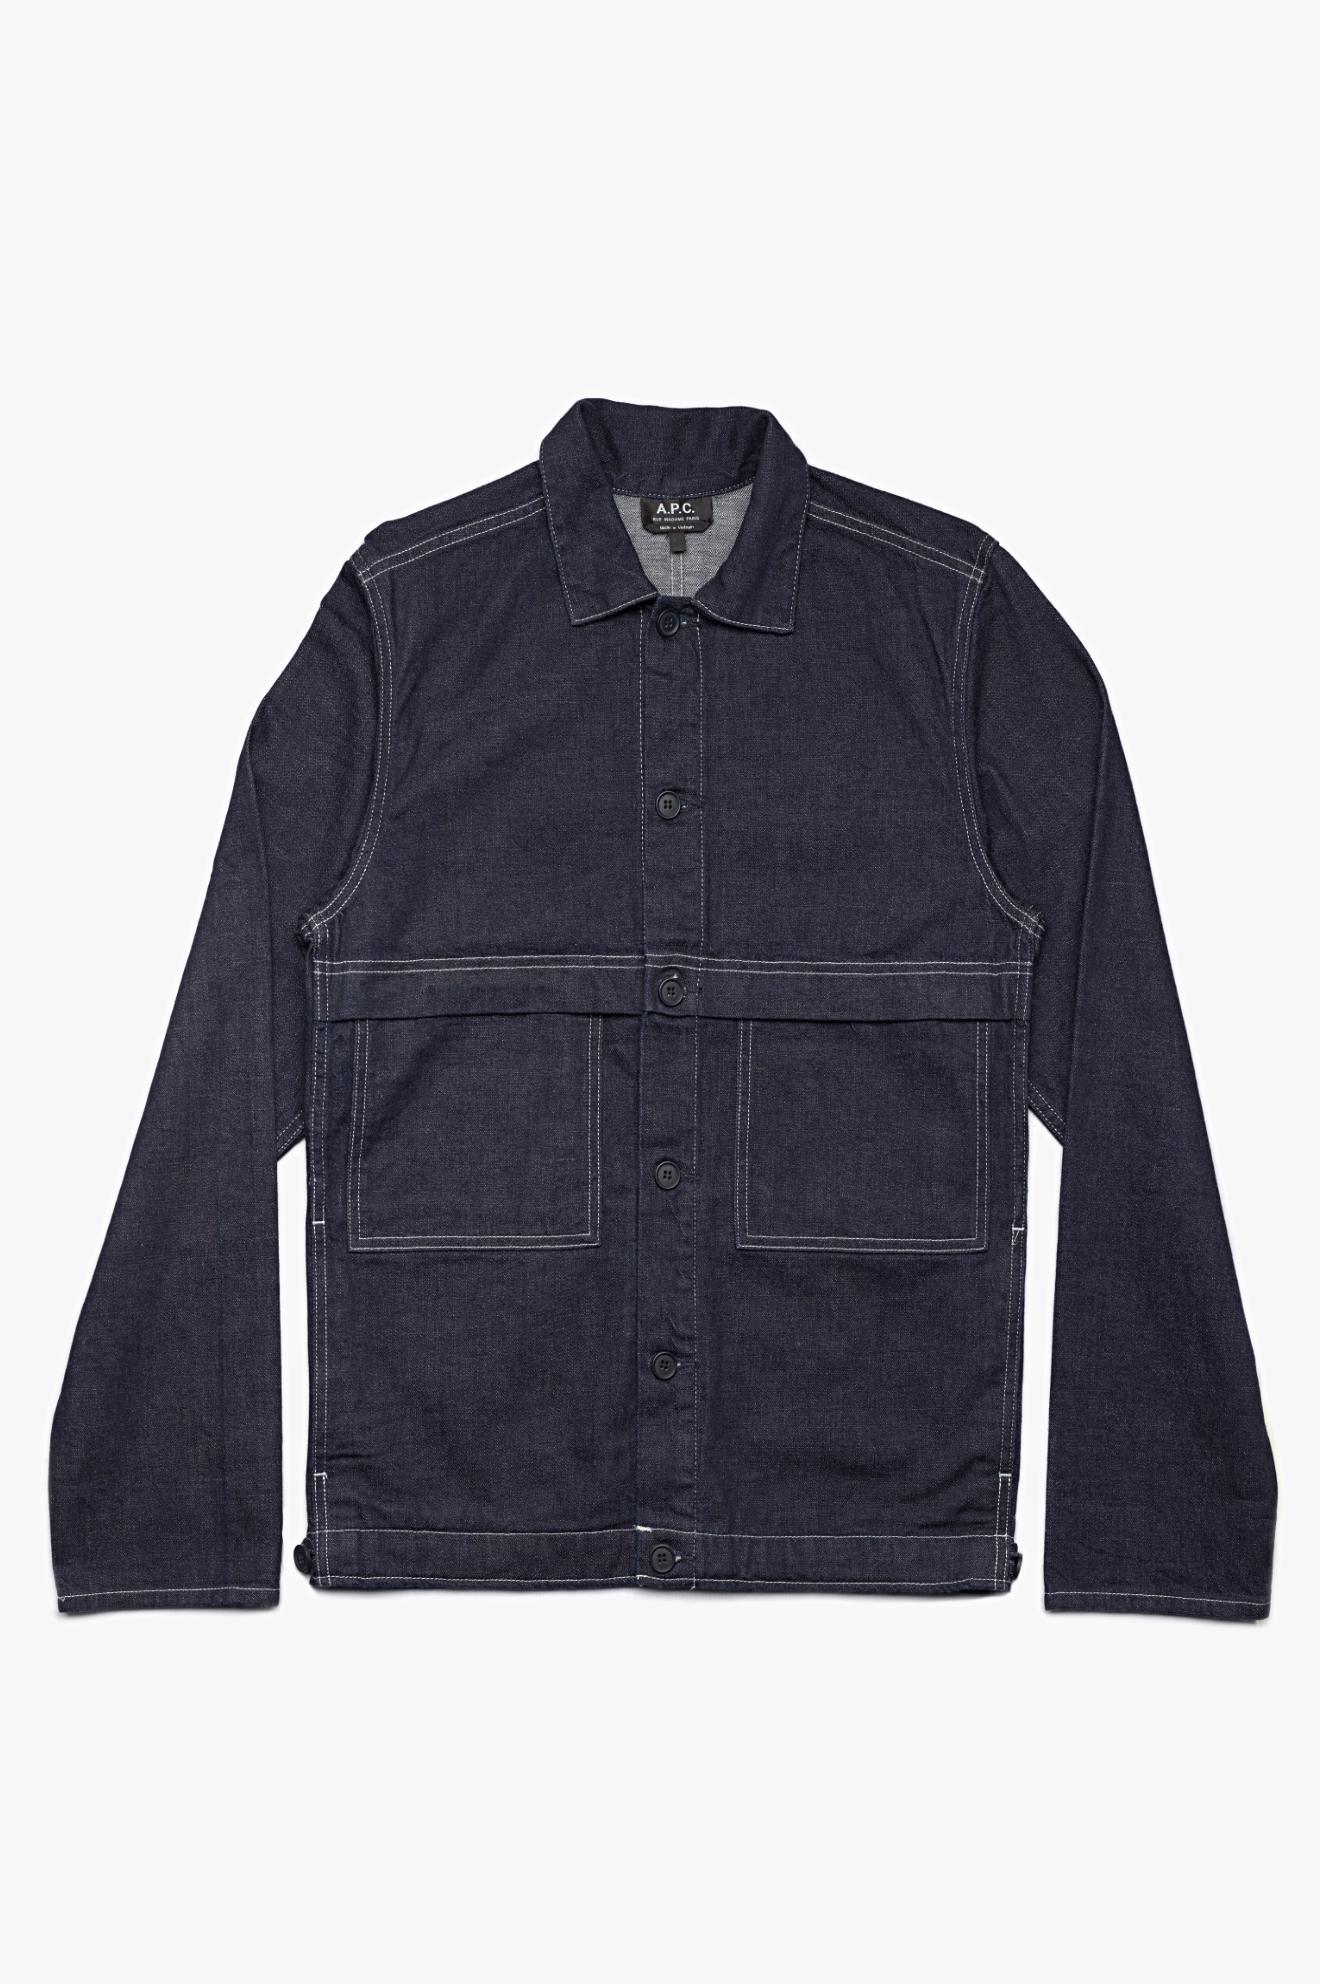 Carnac Jacket